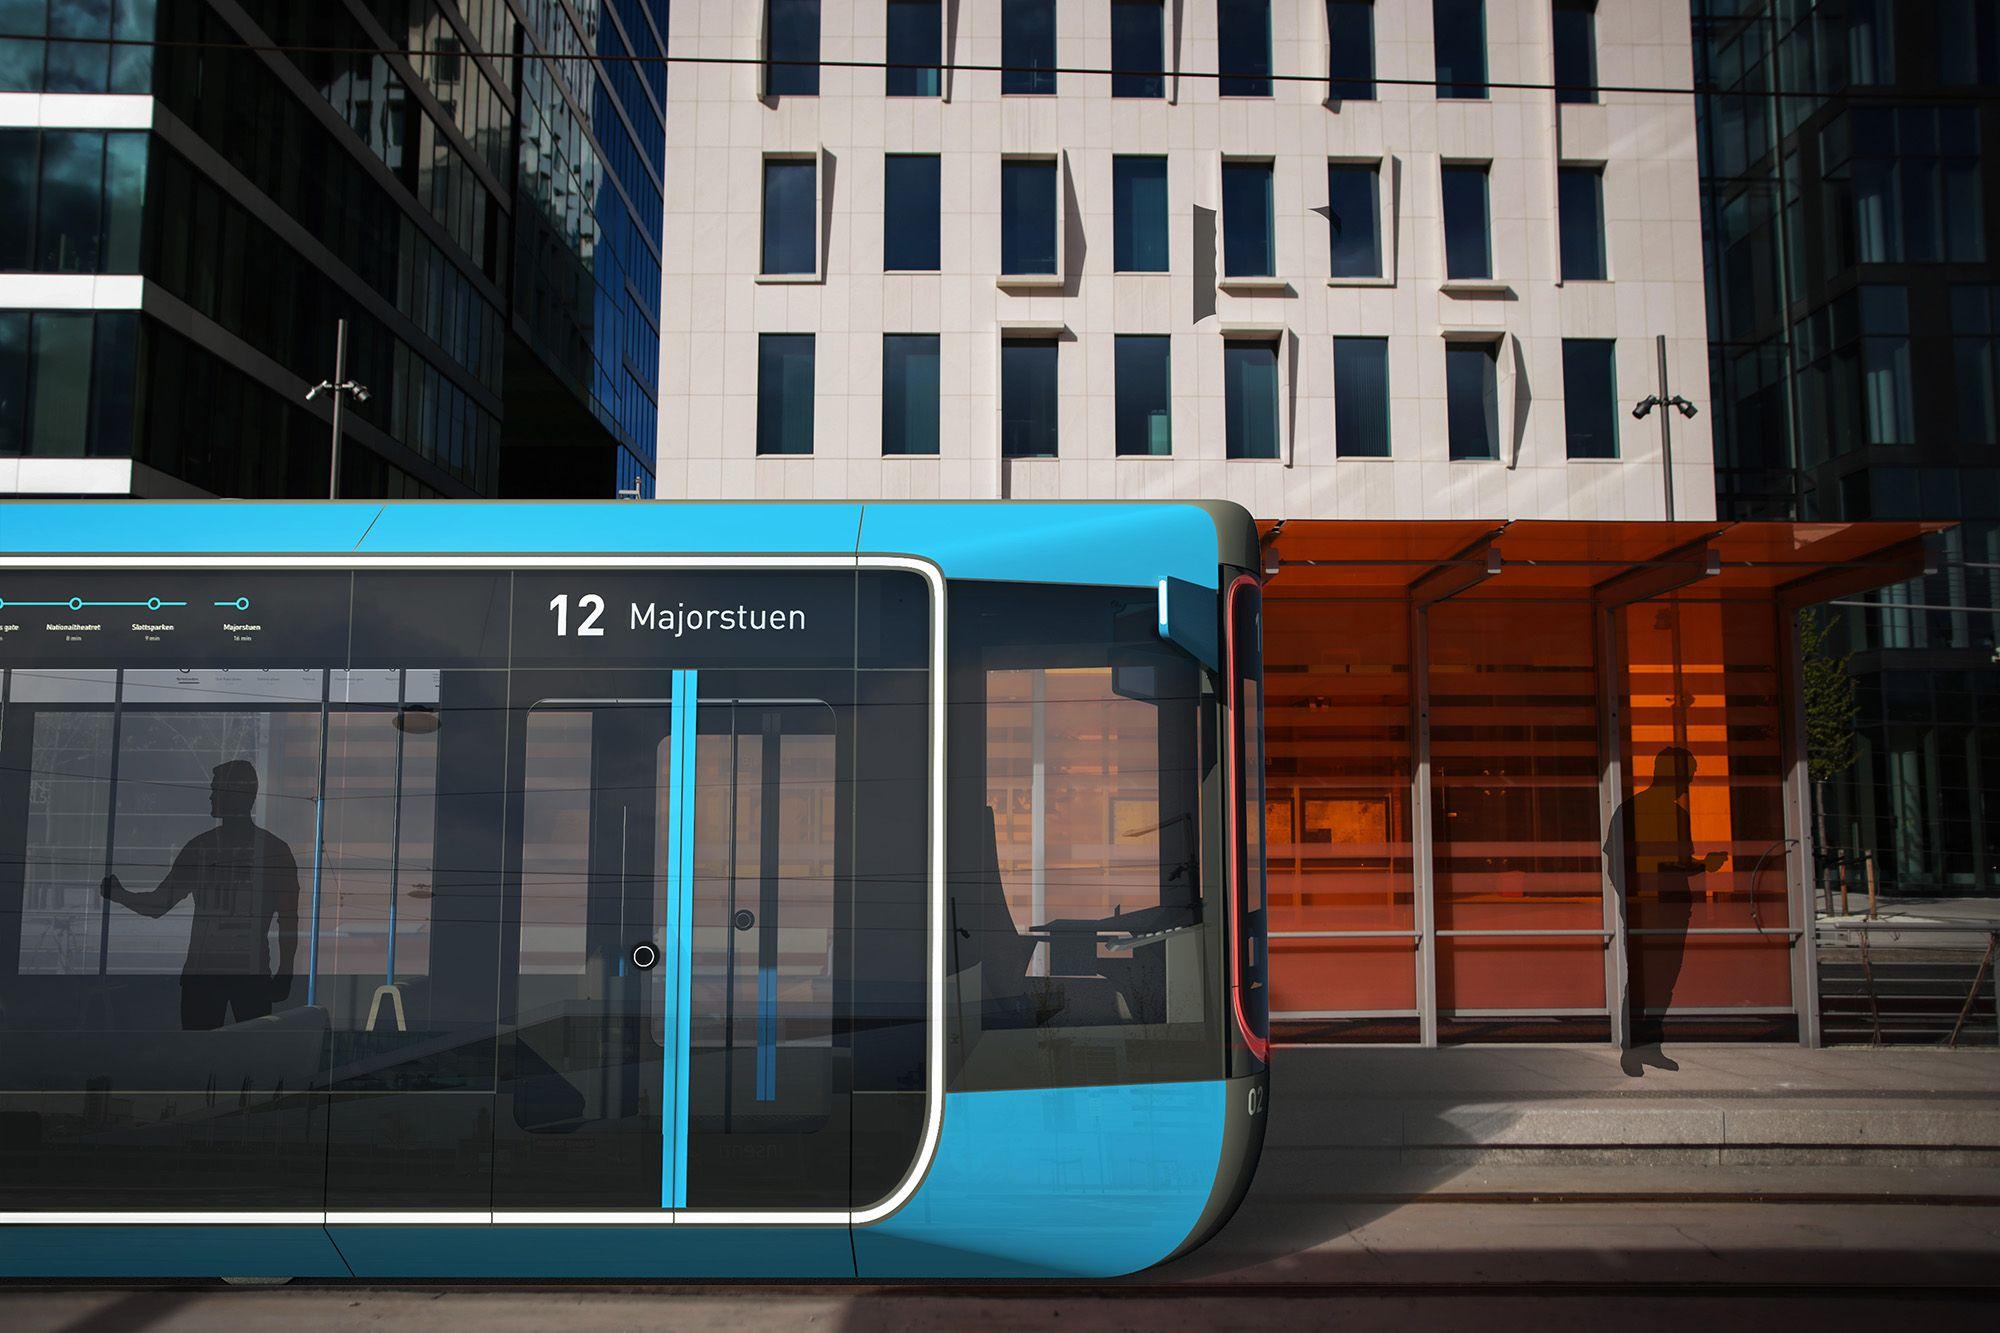 2020 Barcode Jpg Transportation Design Oslo Opera House Design